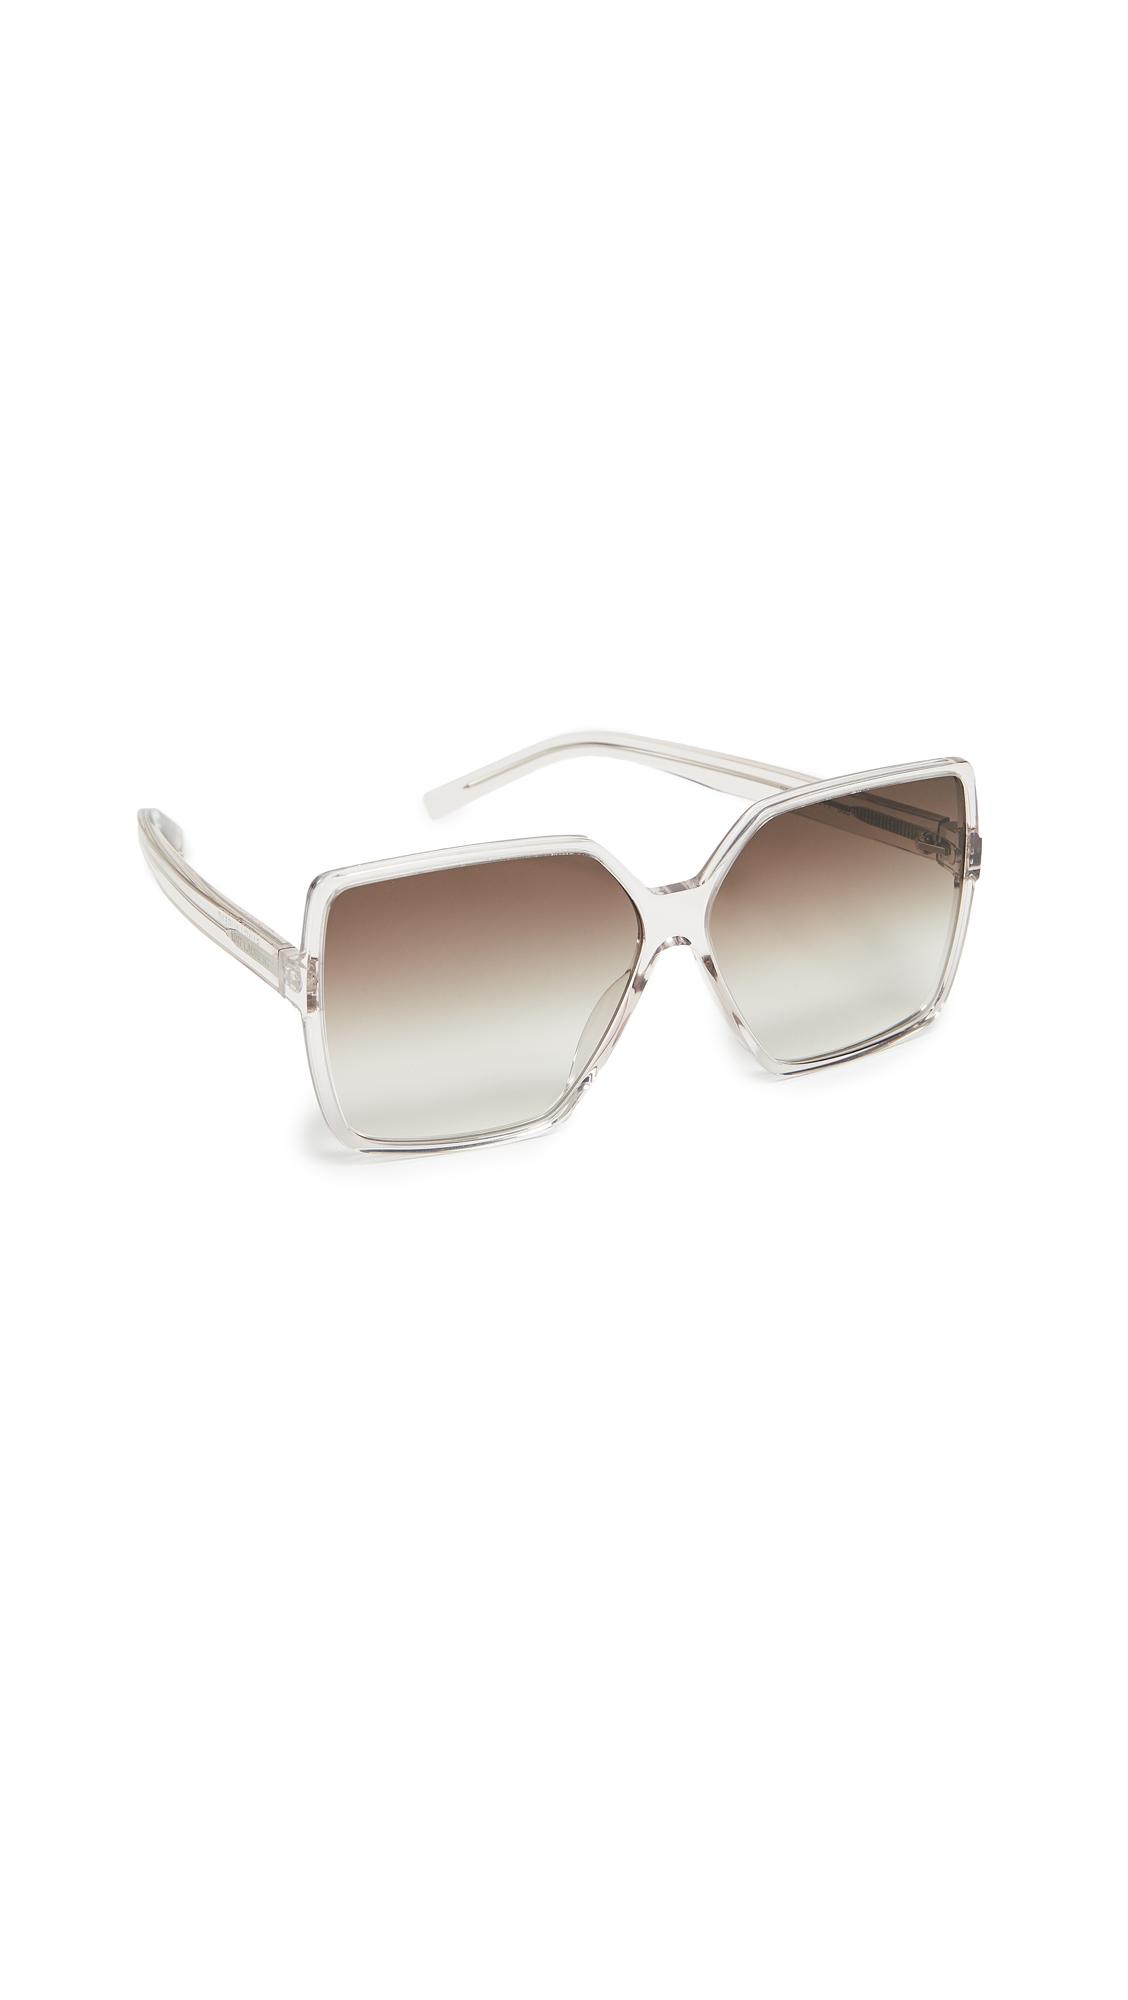 Sl 232 Betty Sunglasses, Transparent Powder/Gradient